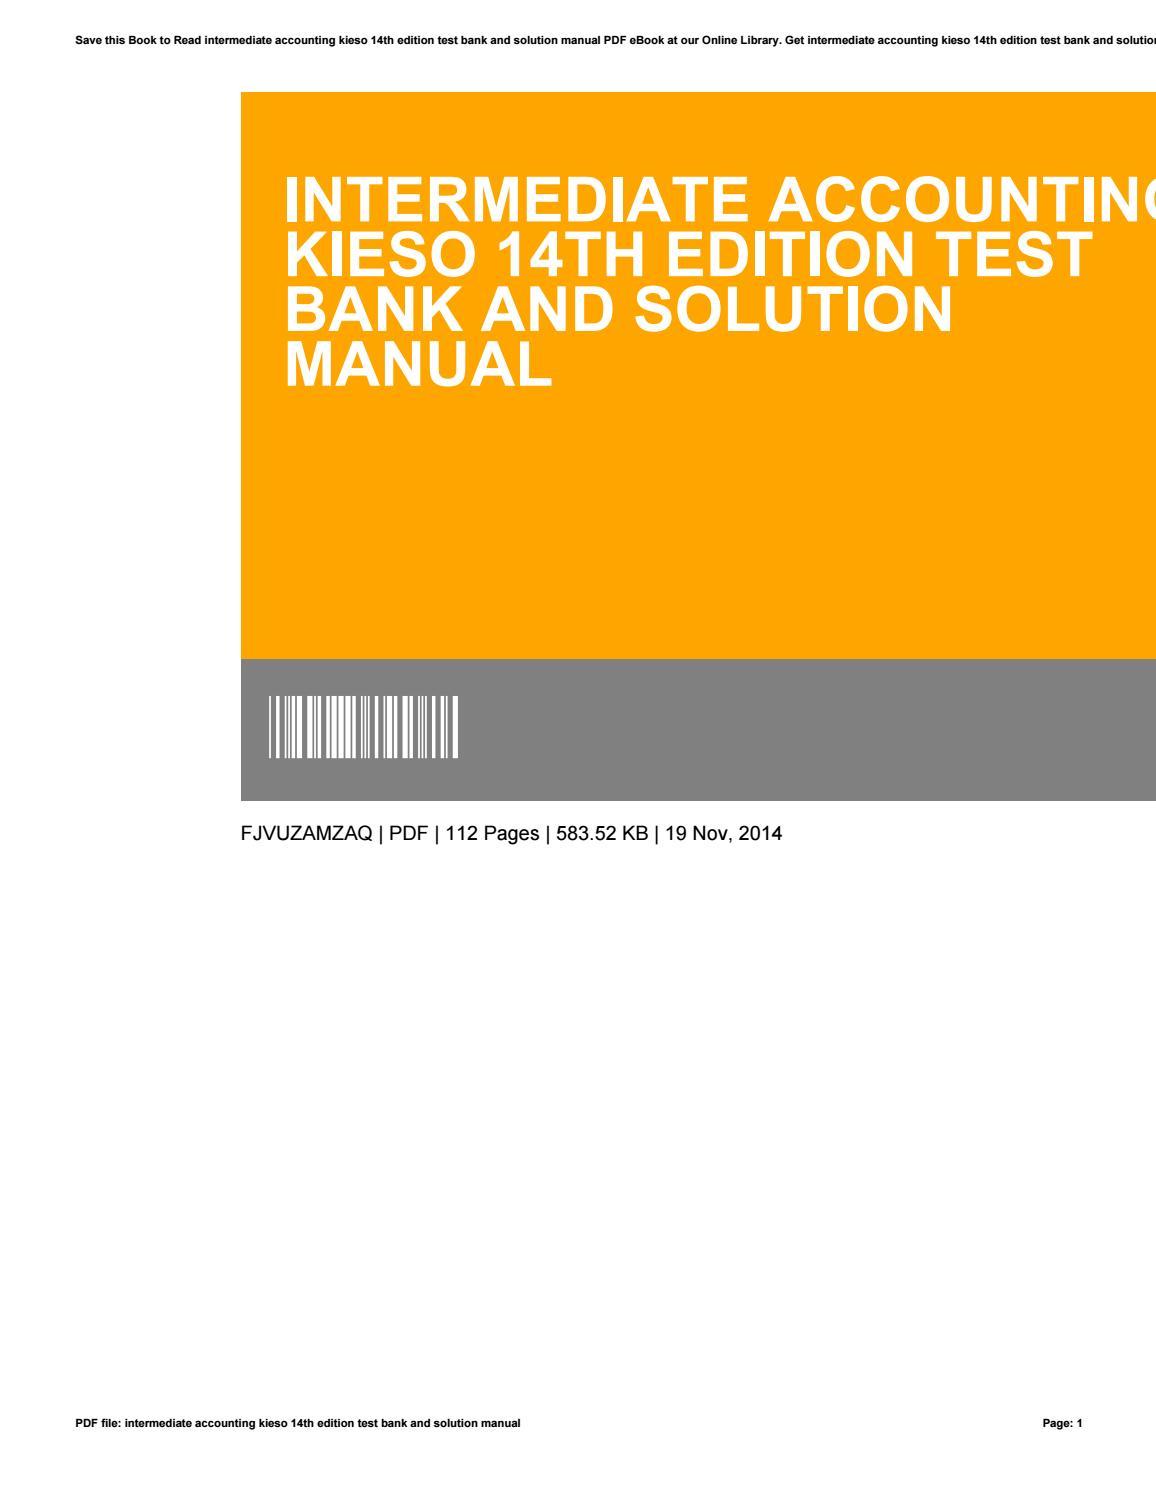 Intermediate accounting kieso 14th edition test bank and solution manual by  SalvadorGlenn1682 - issuu